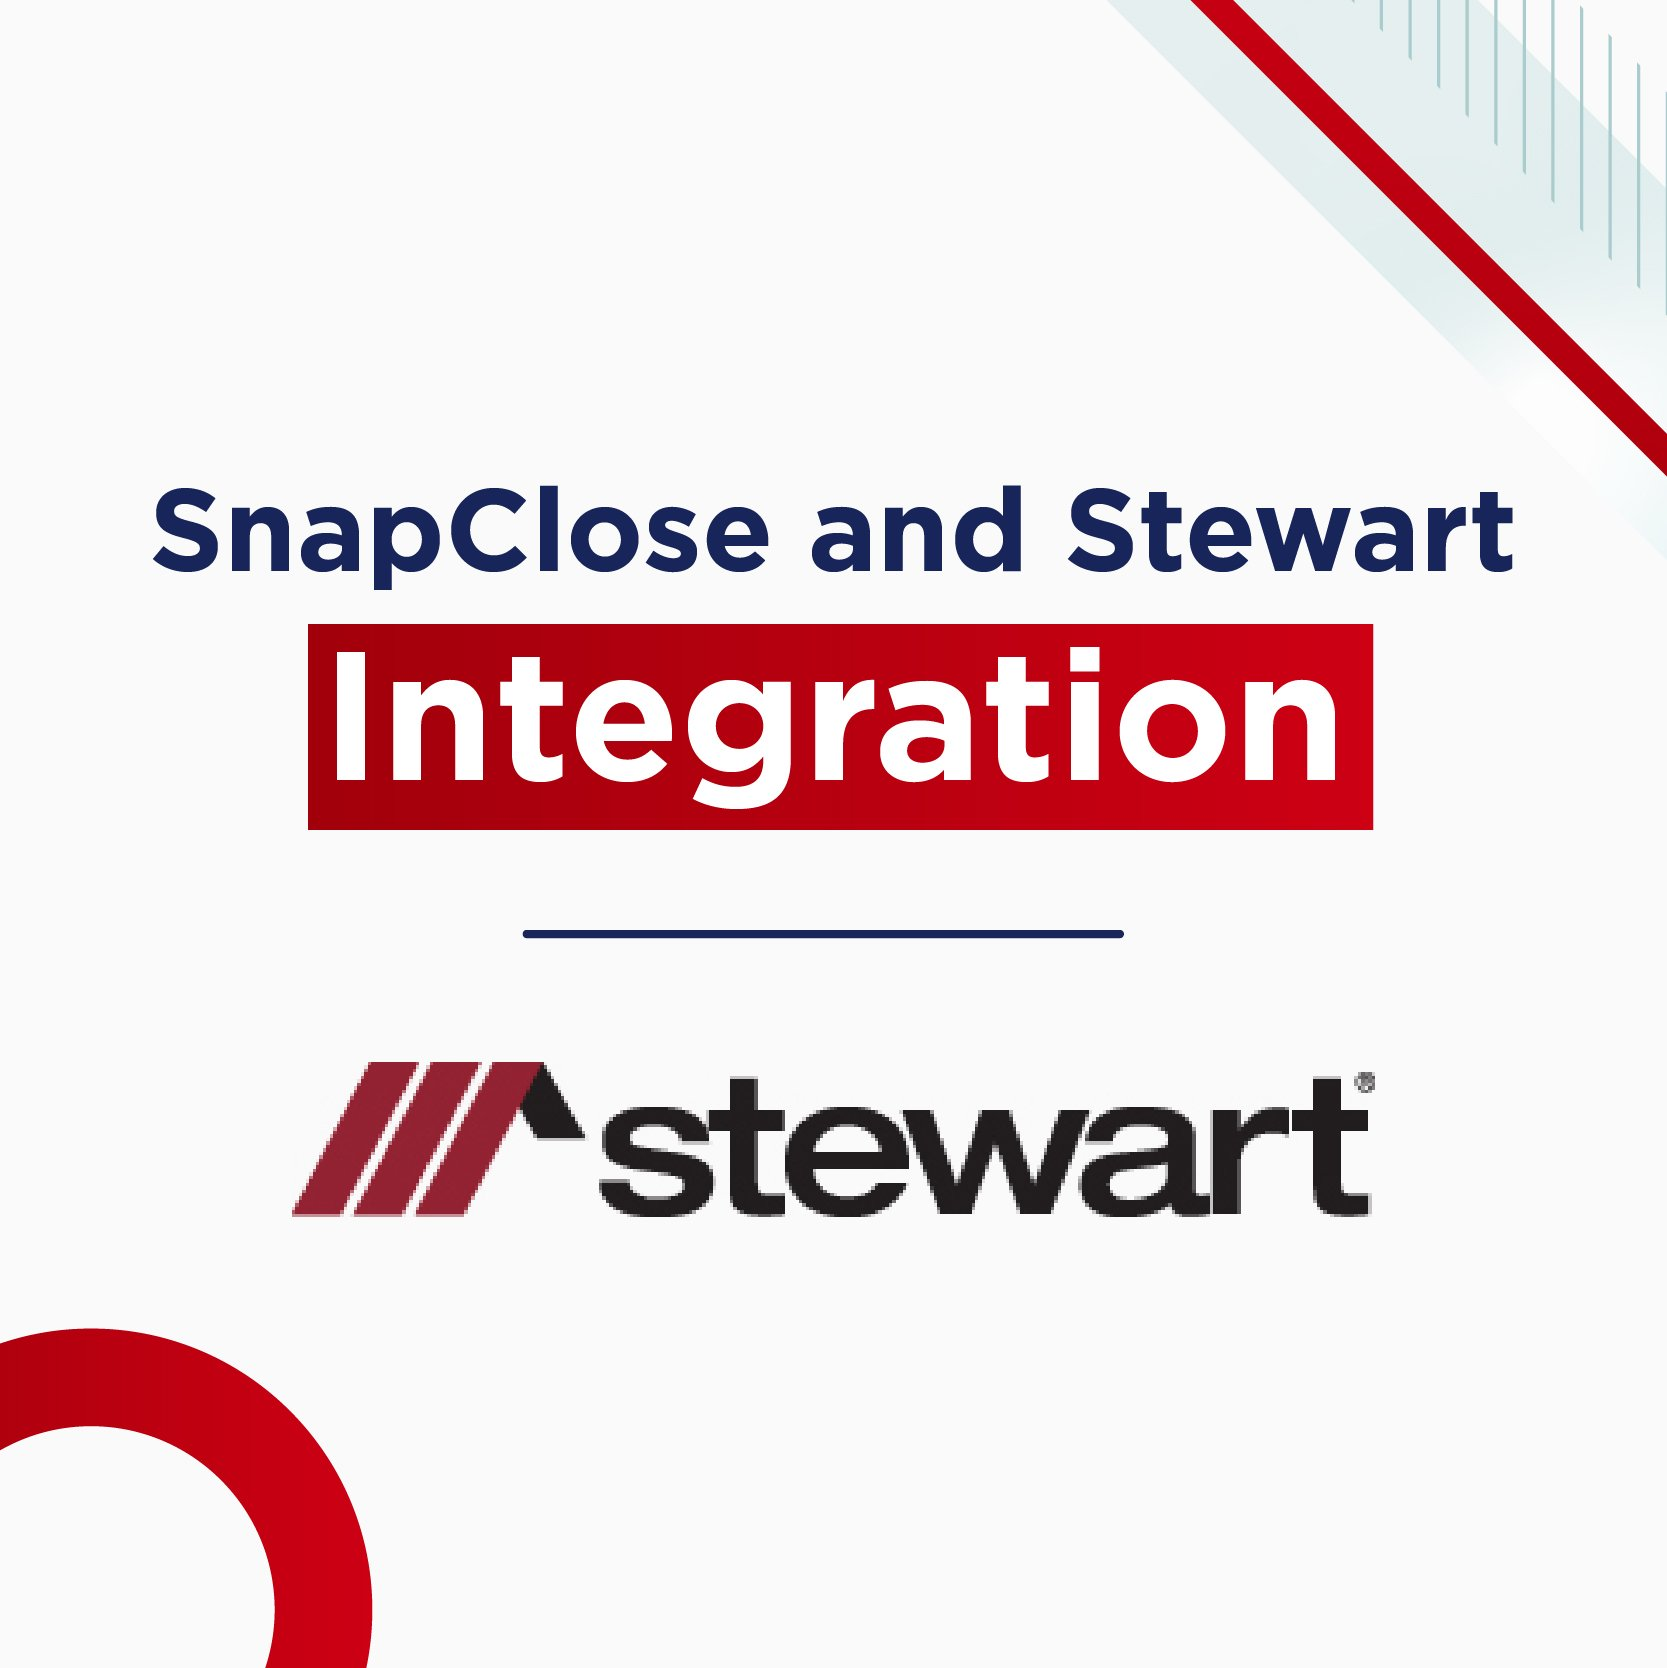 Stewart & SnapClose Integration Webinar